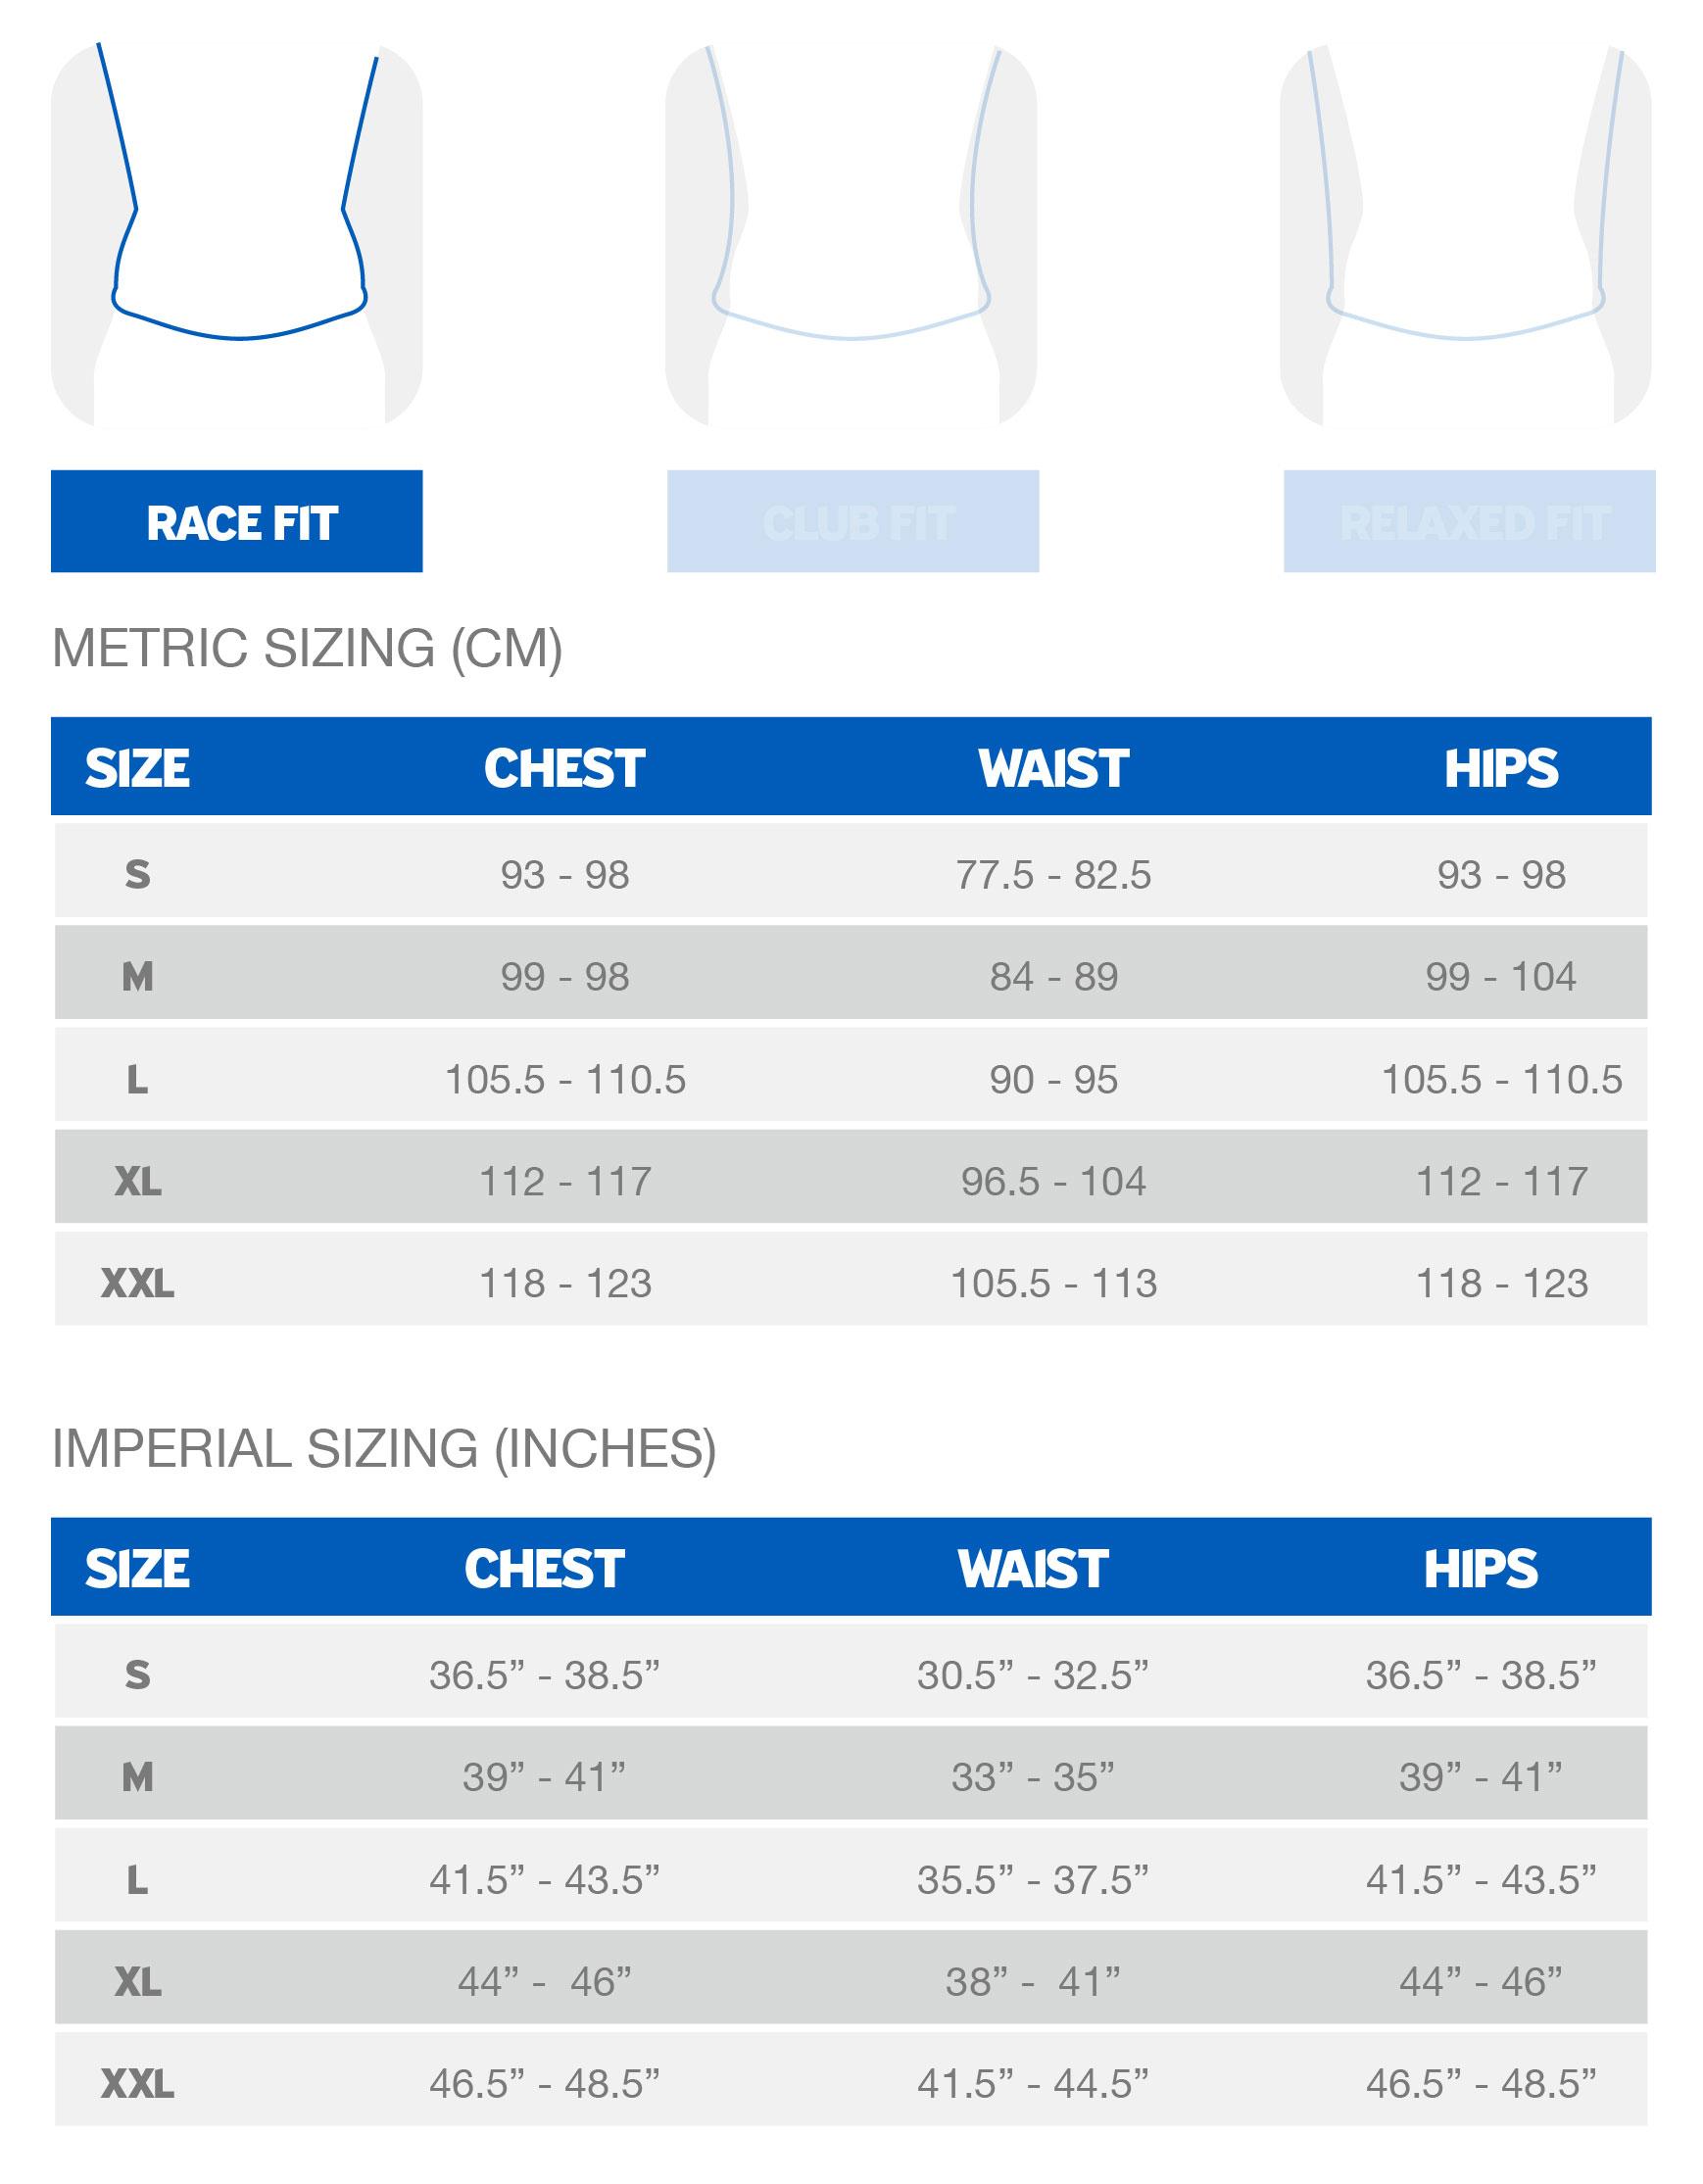 Giant Men's Race Fit sizing chart